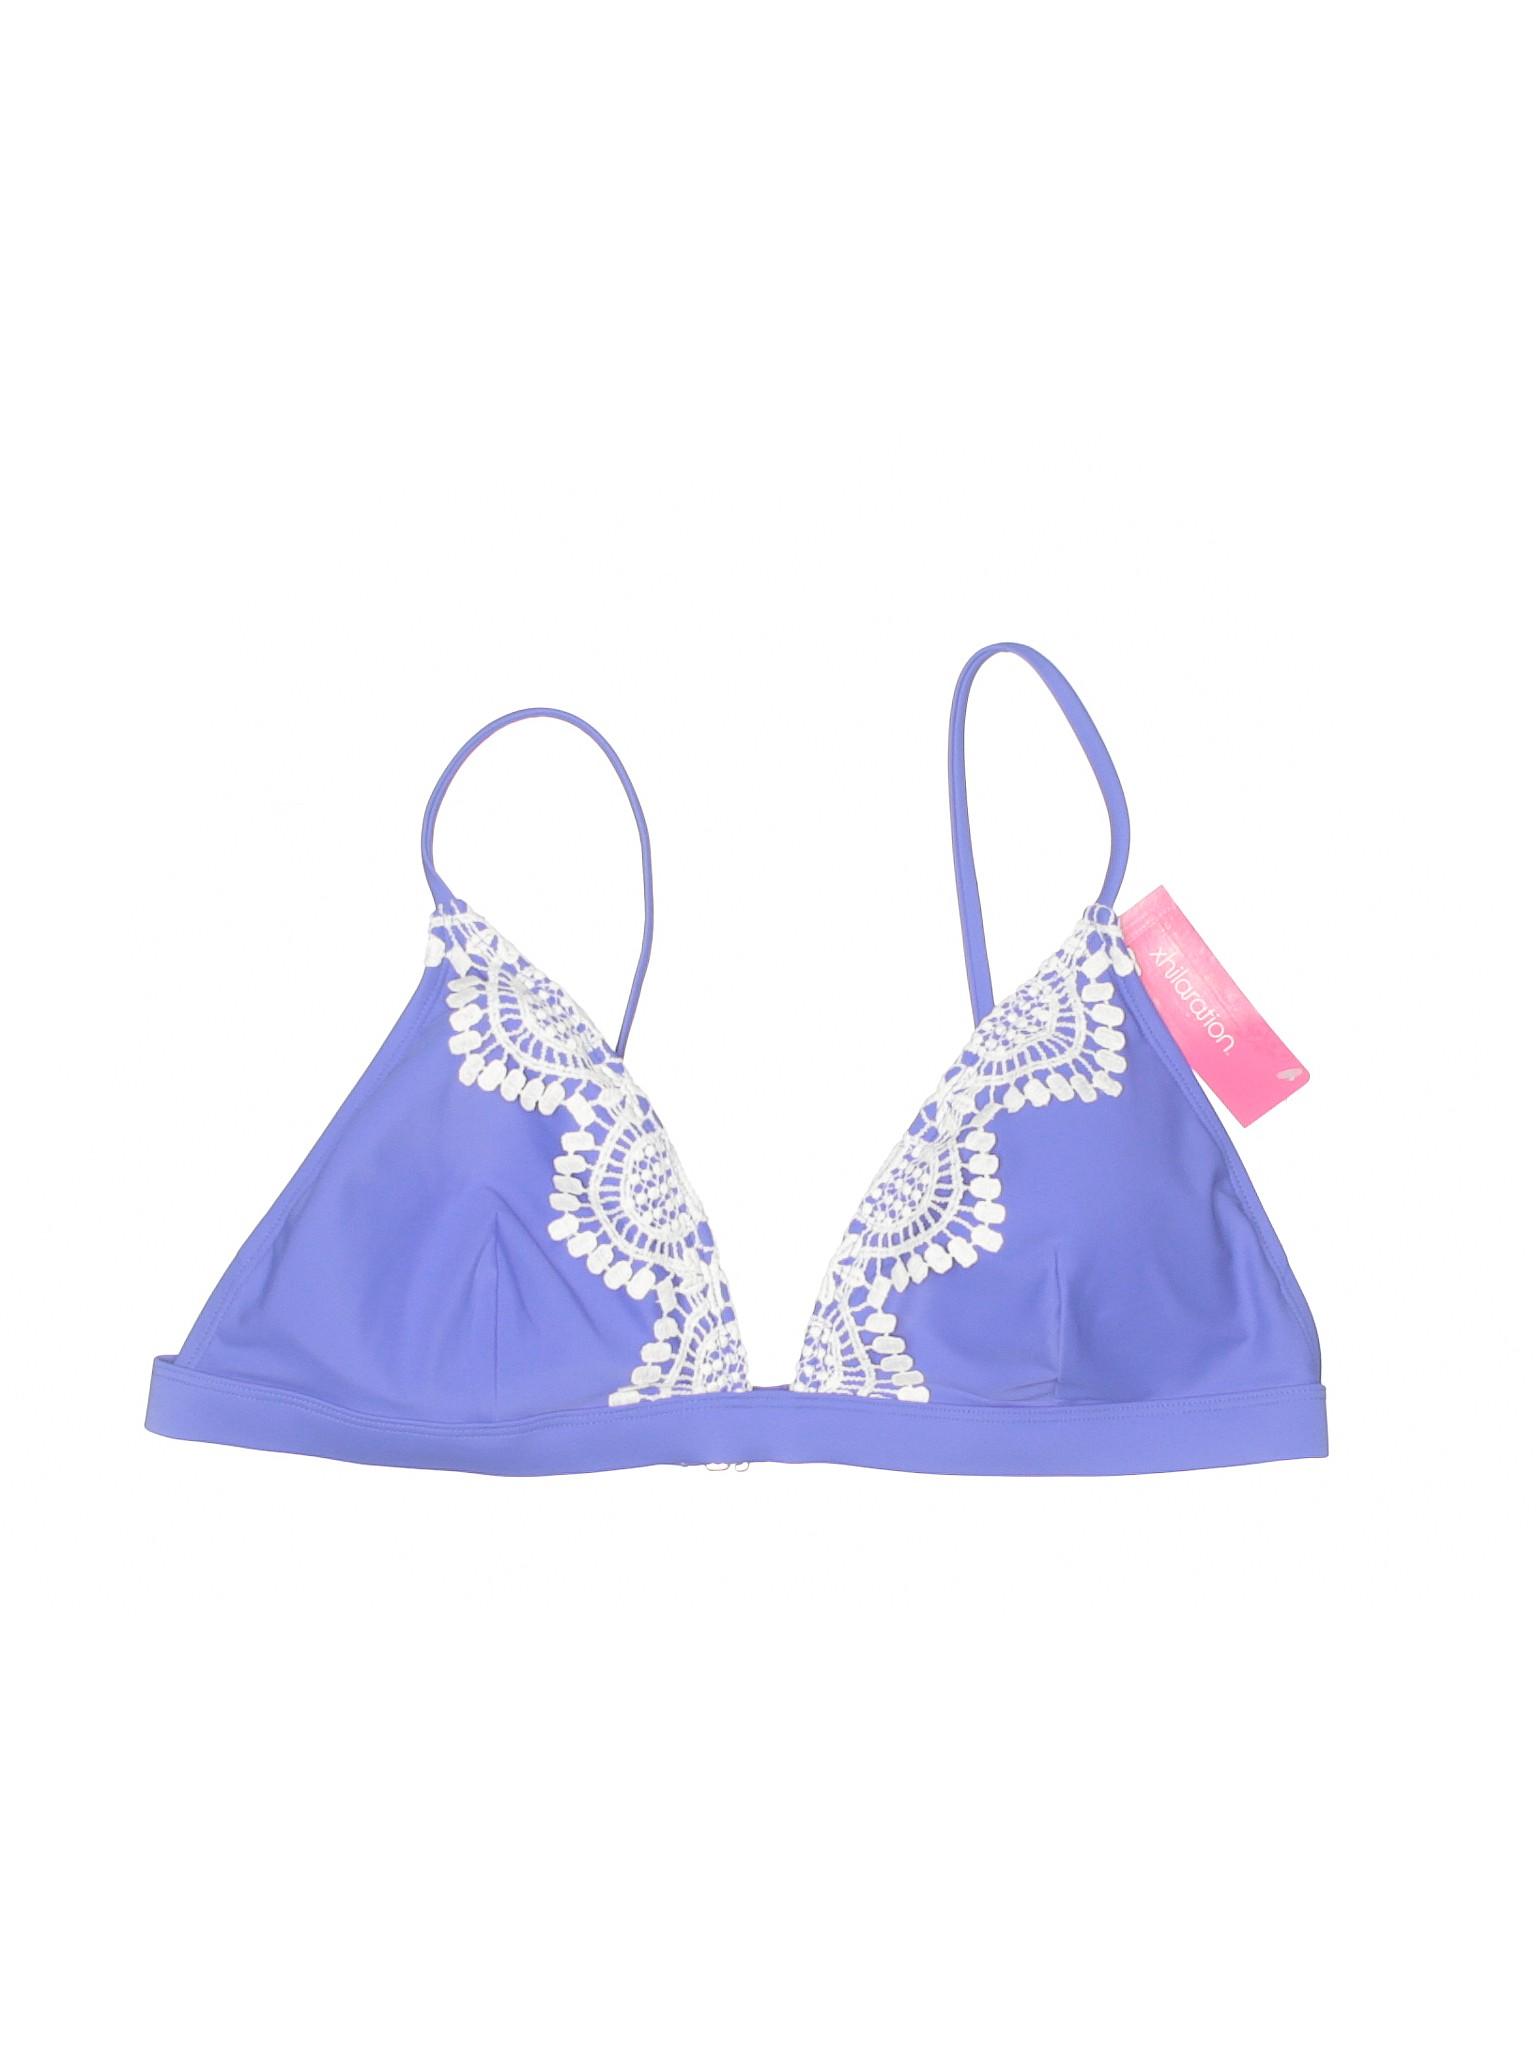 Top Boutique Xhilaration Xhilaration Boutique Swimsuit Swimsuit 8RaxznXqw